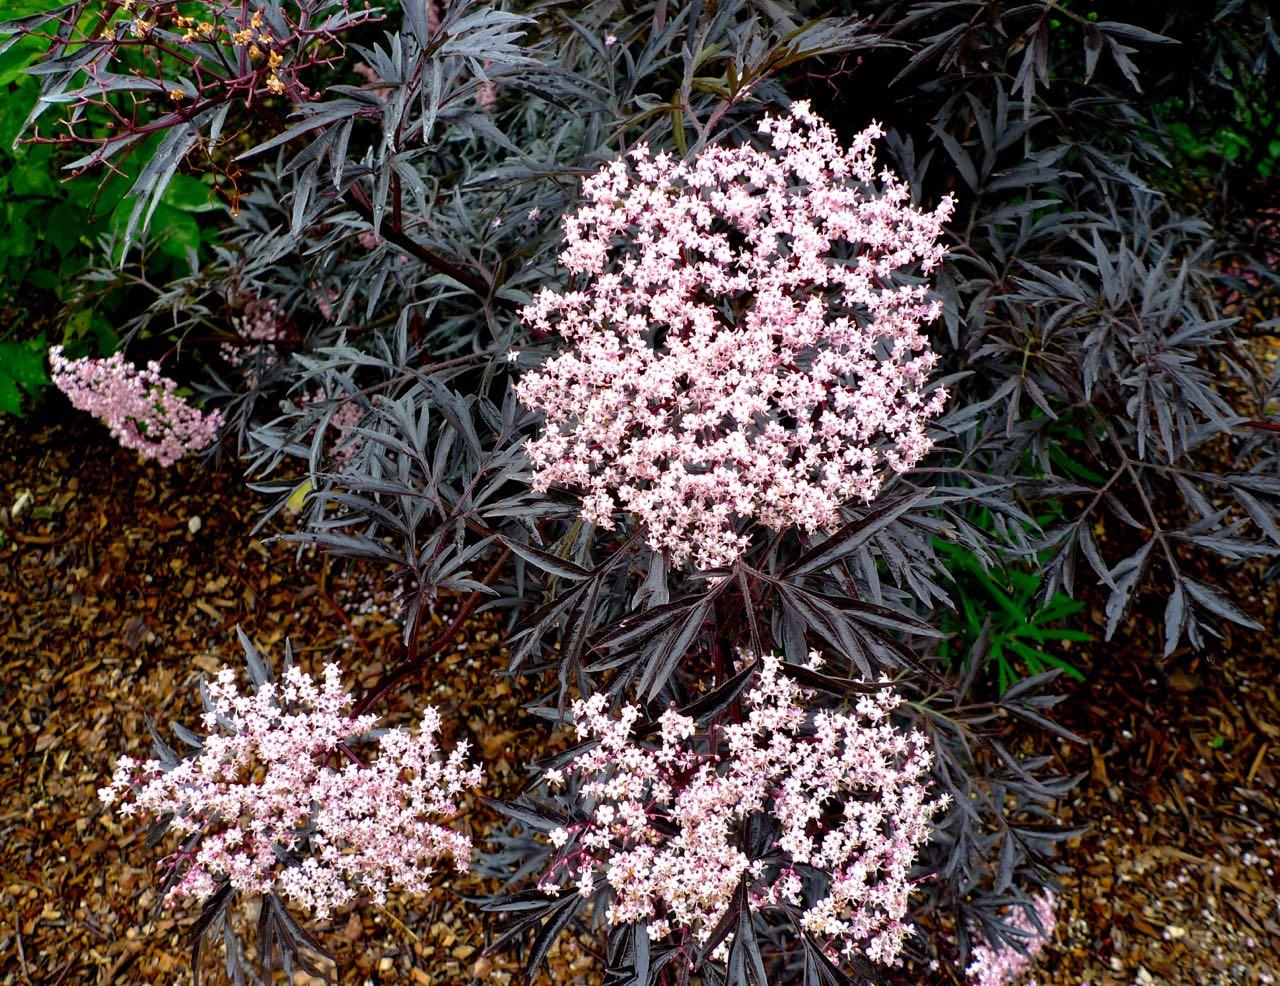 Sambucus Nigra is a gorgeous mix of dark foliage and pretty pink flowers